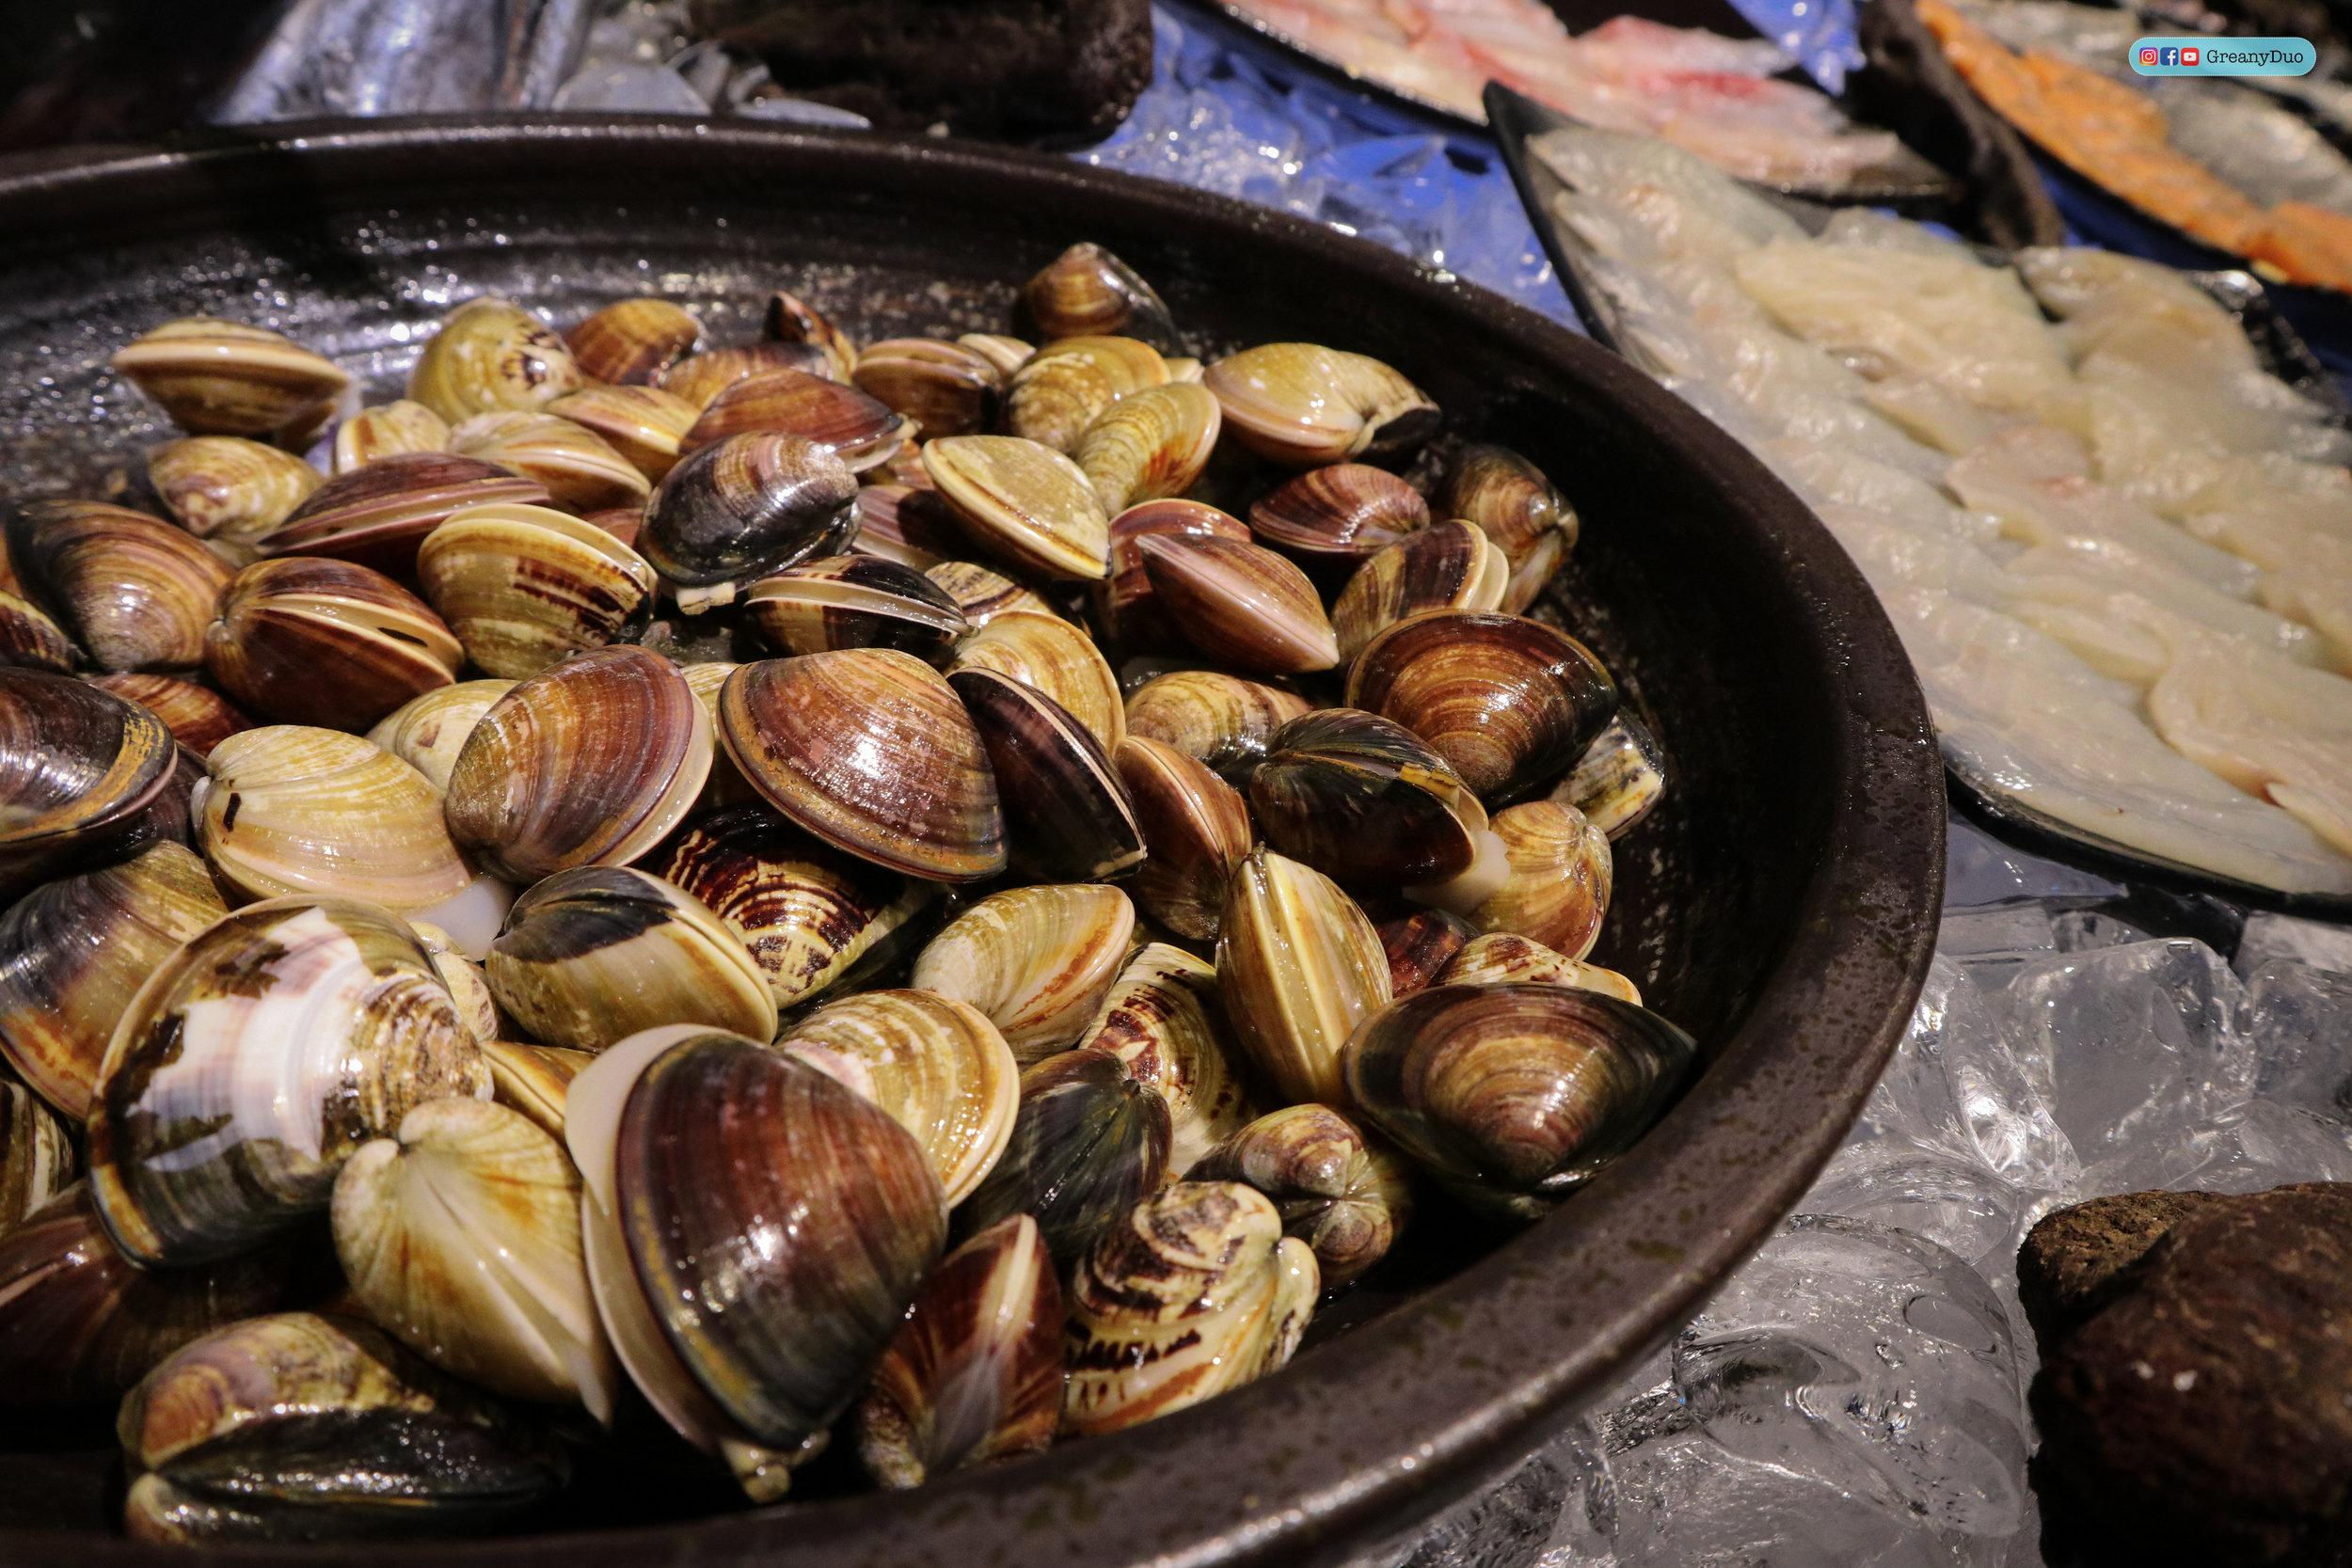 fresh shells at บุฟเฟ่ต์ชาบูไต้หวันที่ Hakkai Shabu Shabu ซีเหมินติง